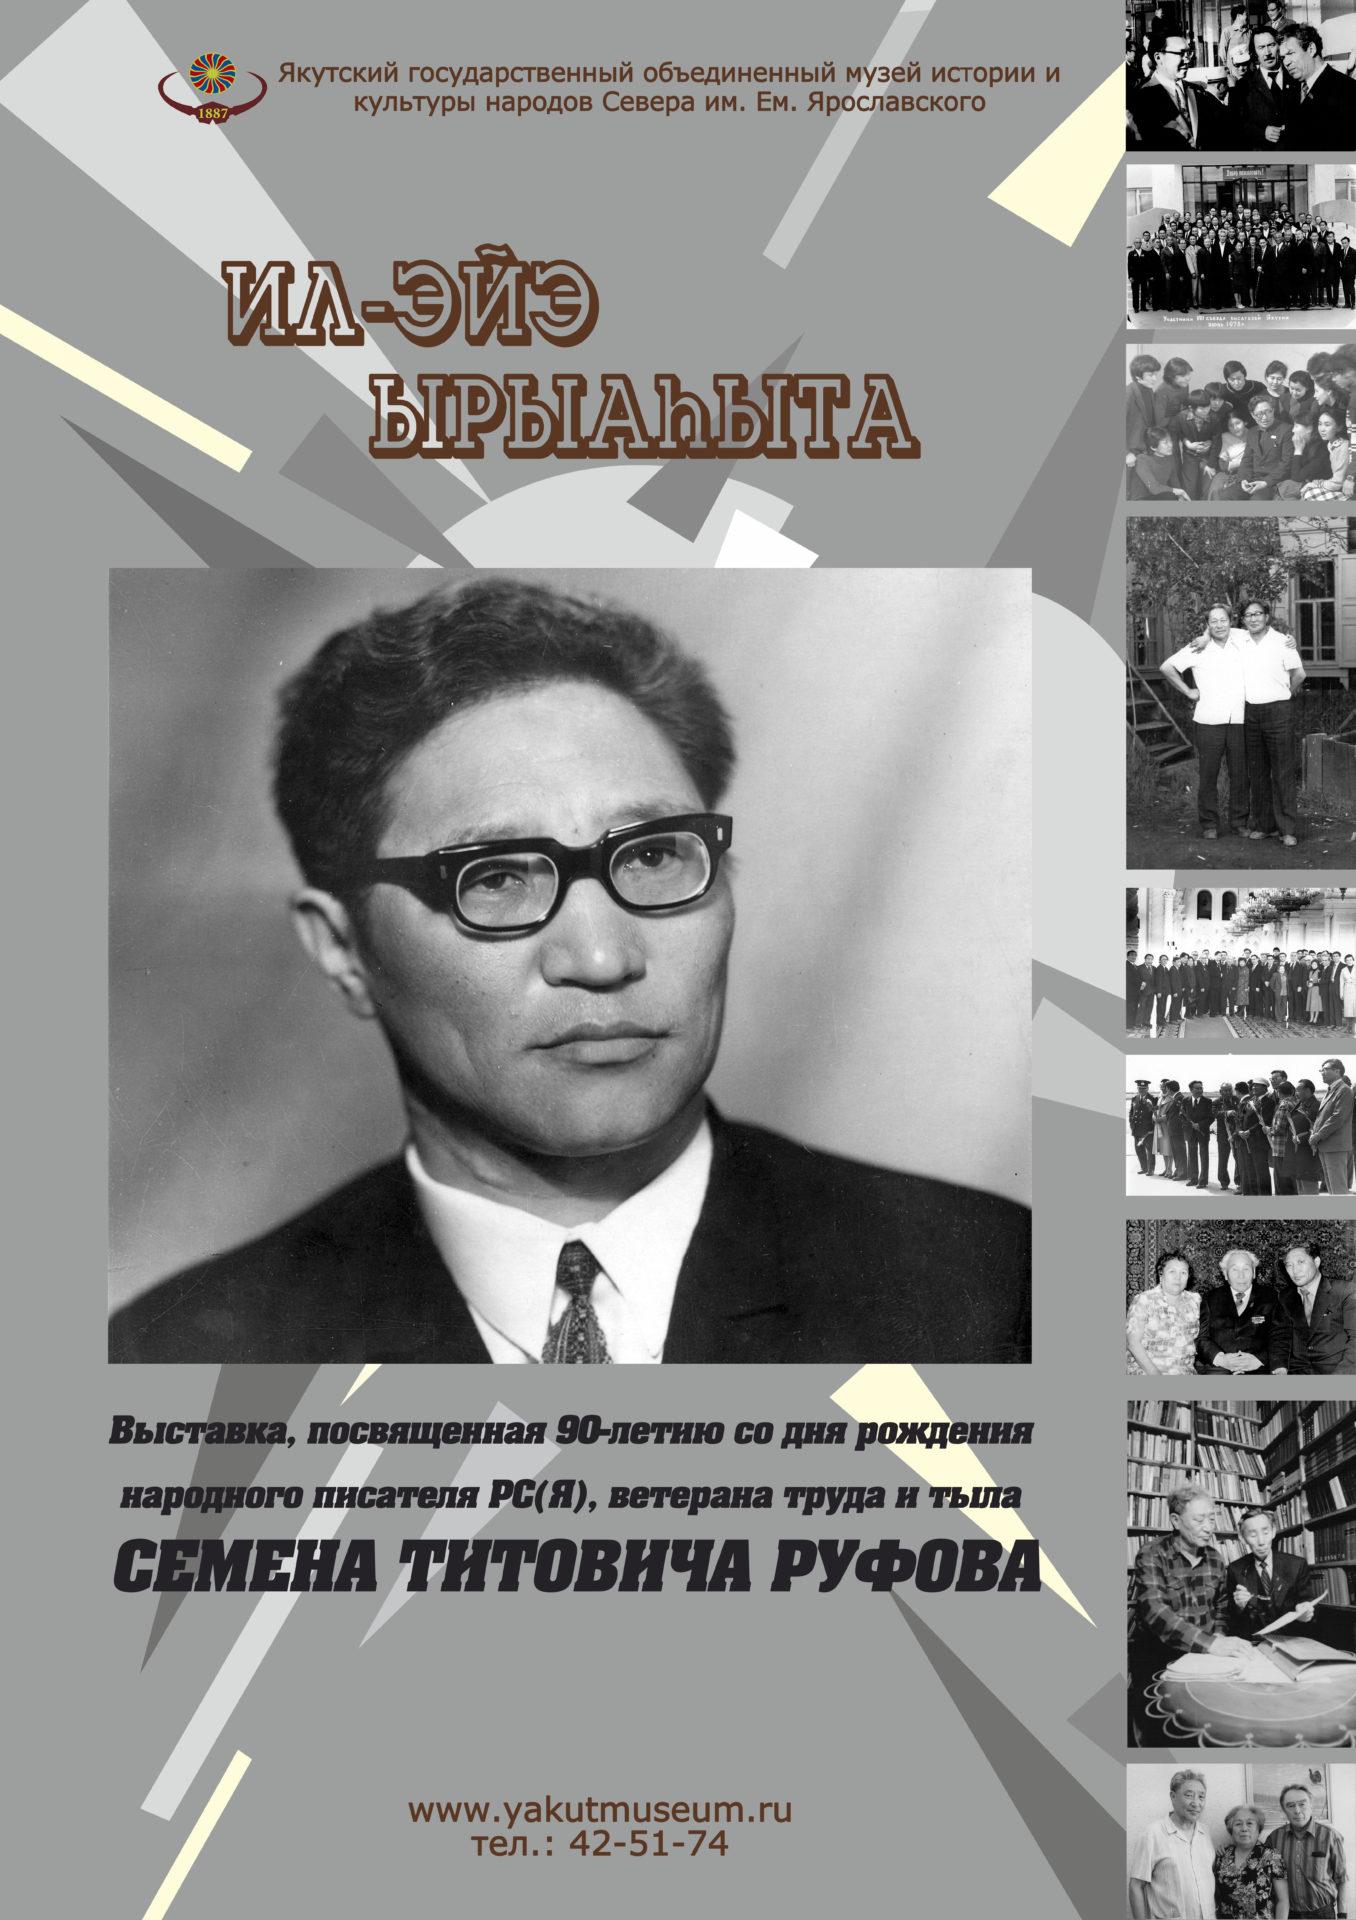 Выставка Семена Титовича Руфова продлена до 30 января